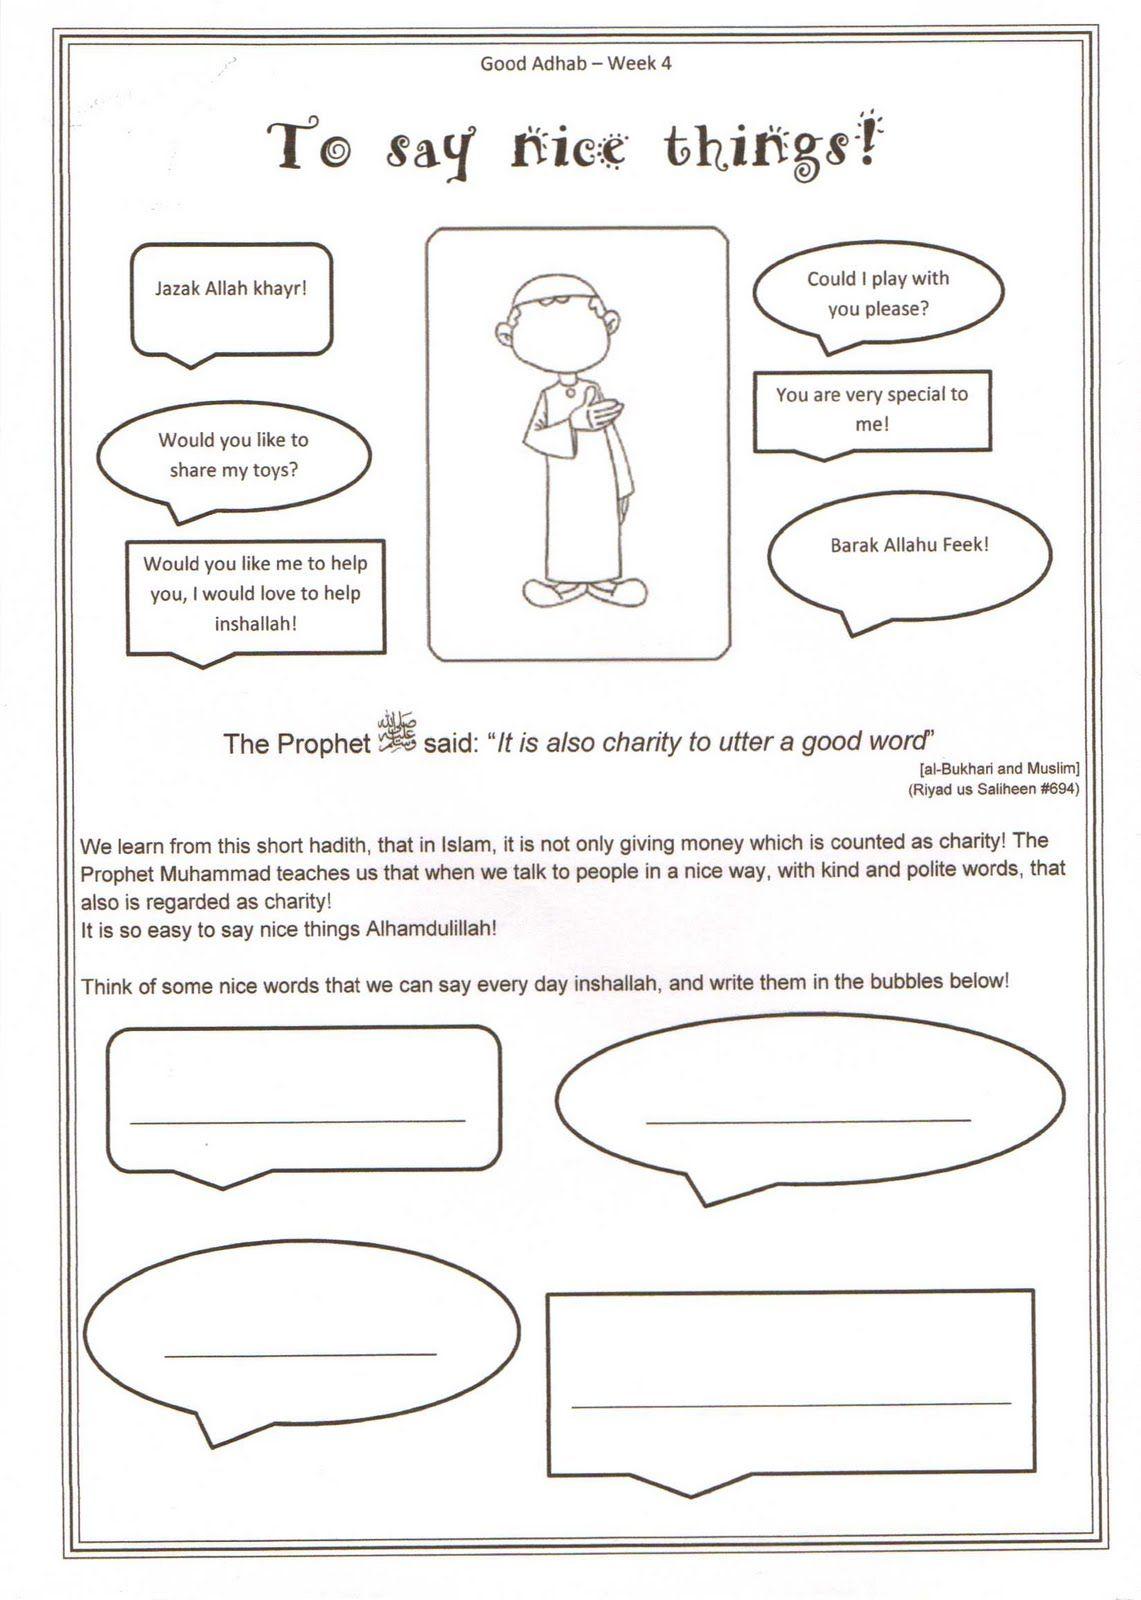 small resolution of Diary of a Muslim homeschool: Good Adhab - Week 4: saying a good word is  charity!   Islamic studies